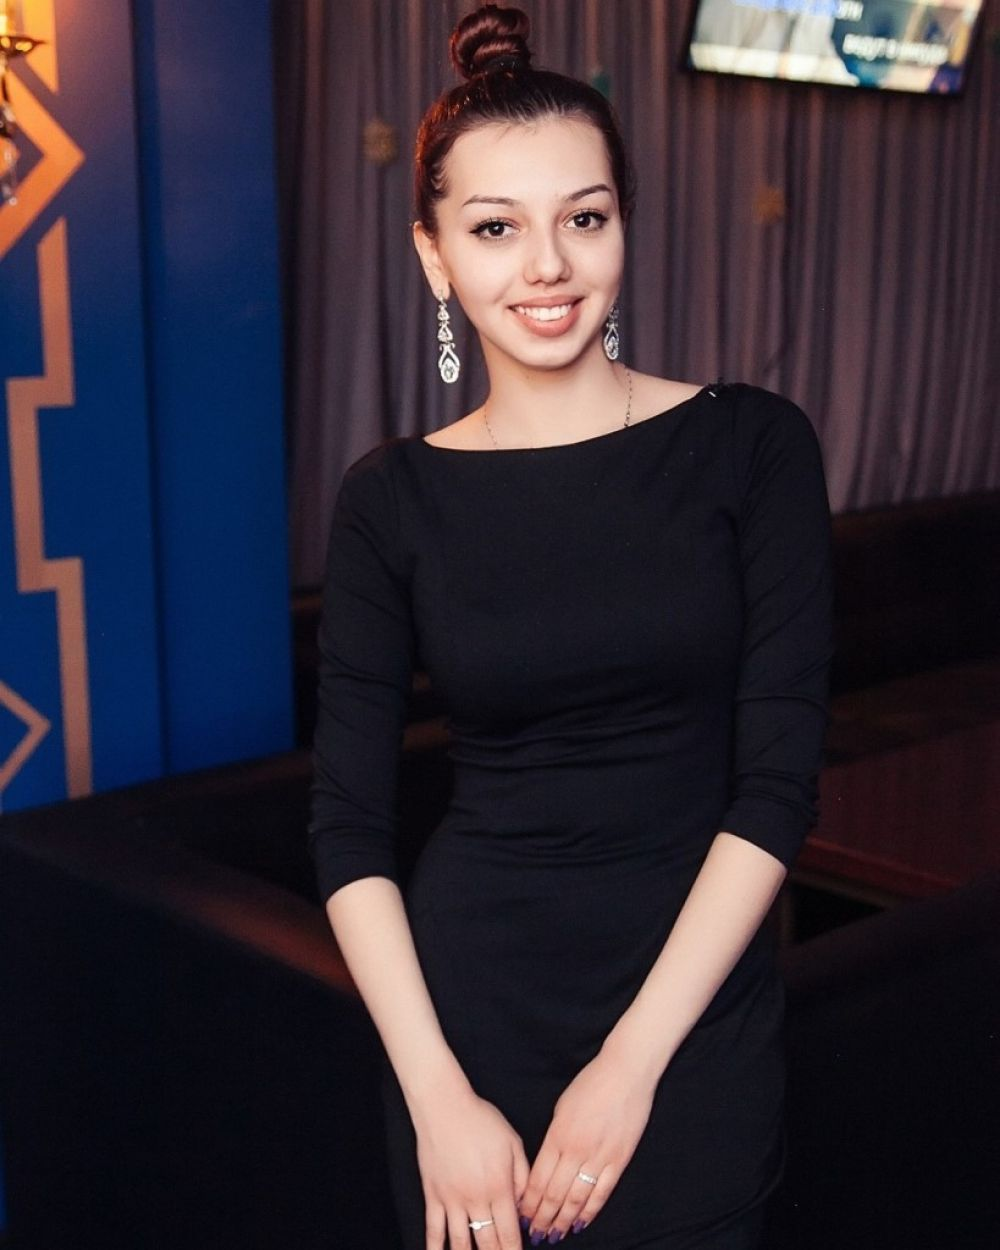 Александра Малинова, 21 год. Менеджер в «Урал Карго». Хобби: аэройога, танцы, чтение книг.